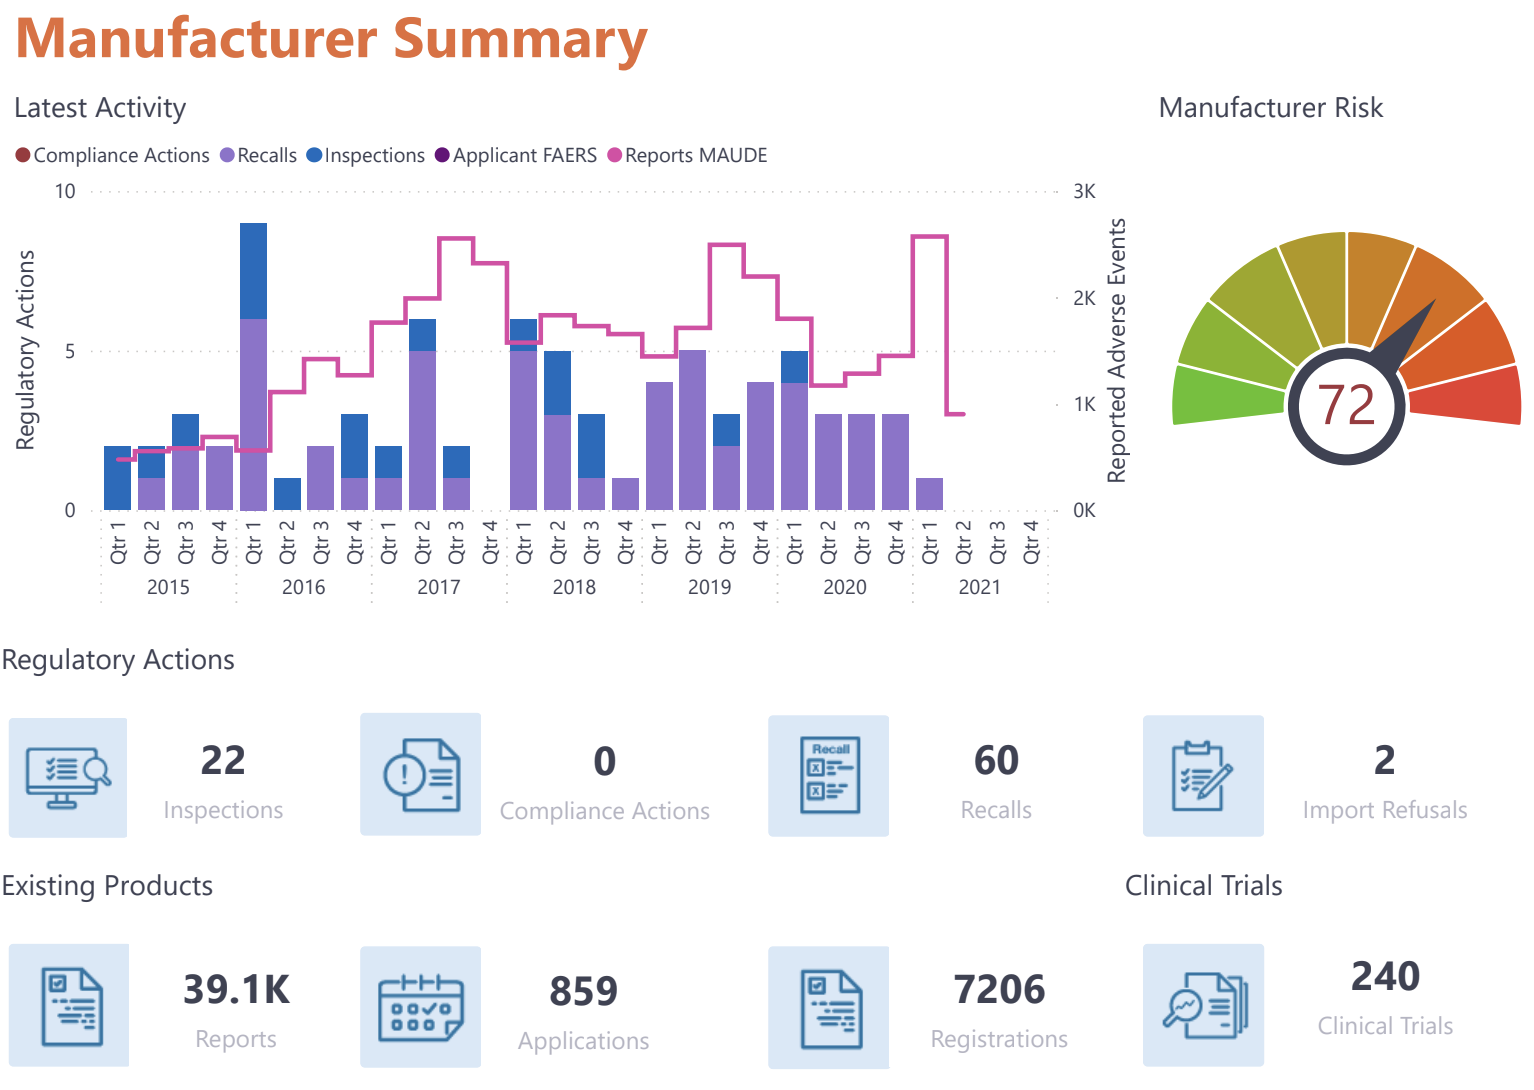 Pandoraplus Manufacturer Summary